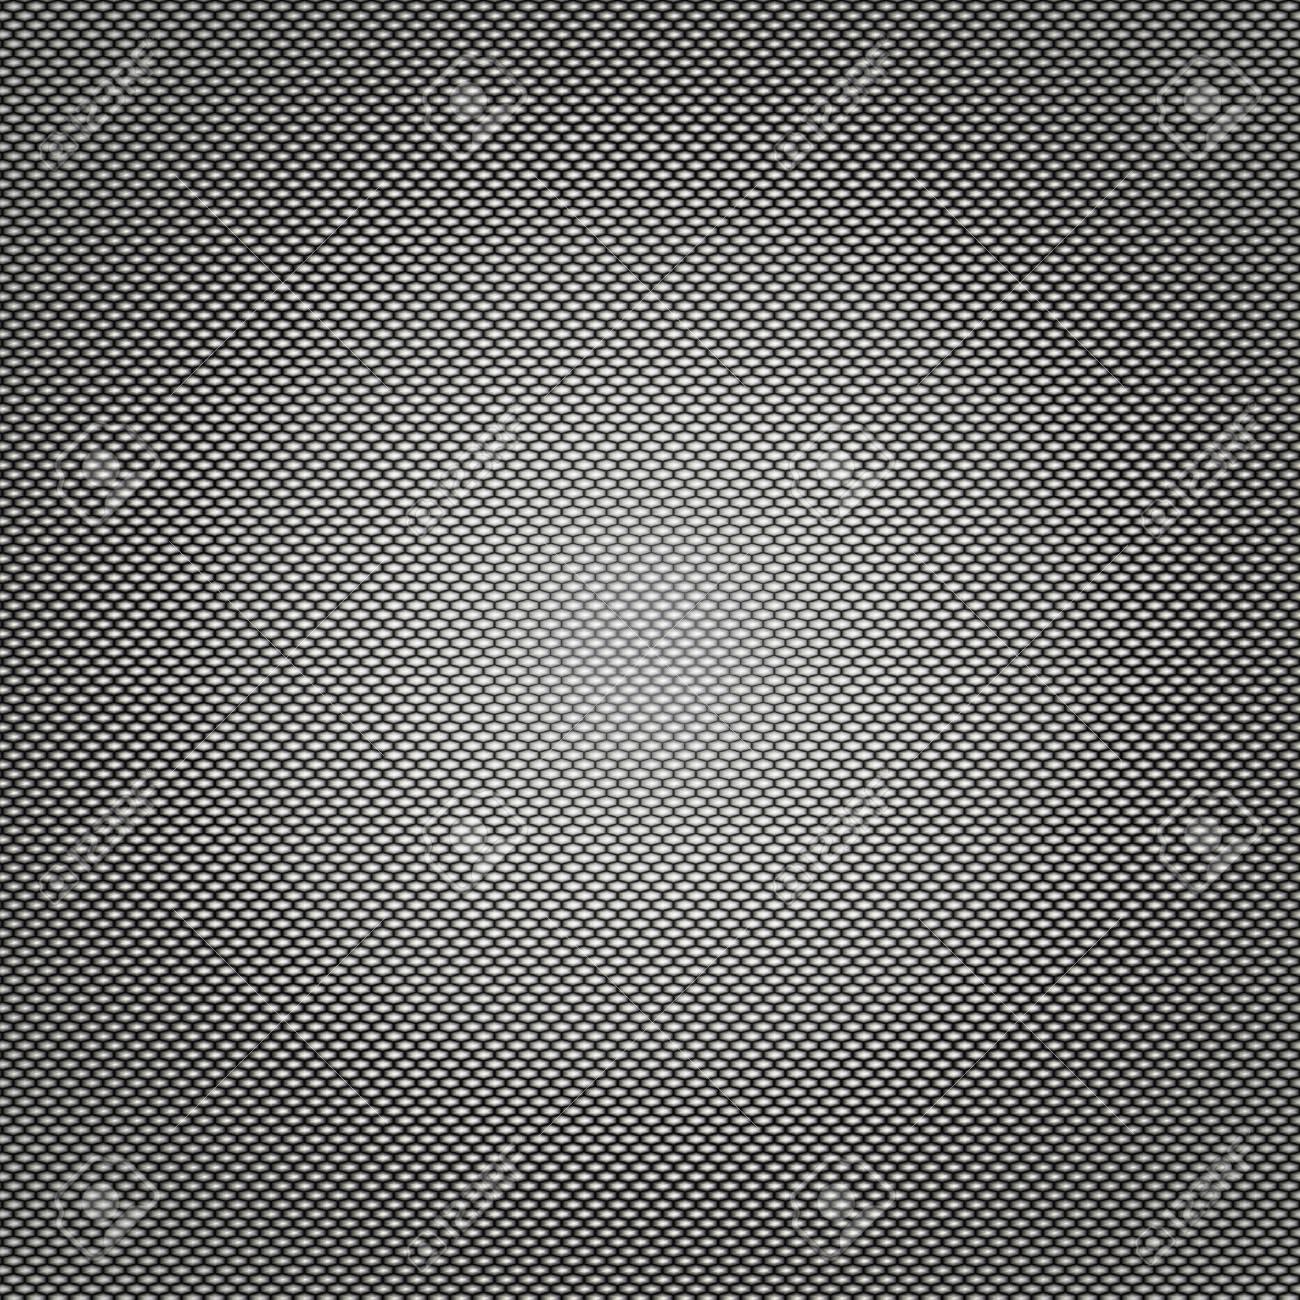 metal surface Stock Photo - 9906001